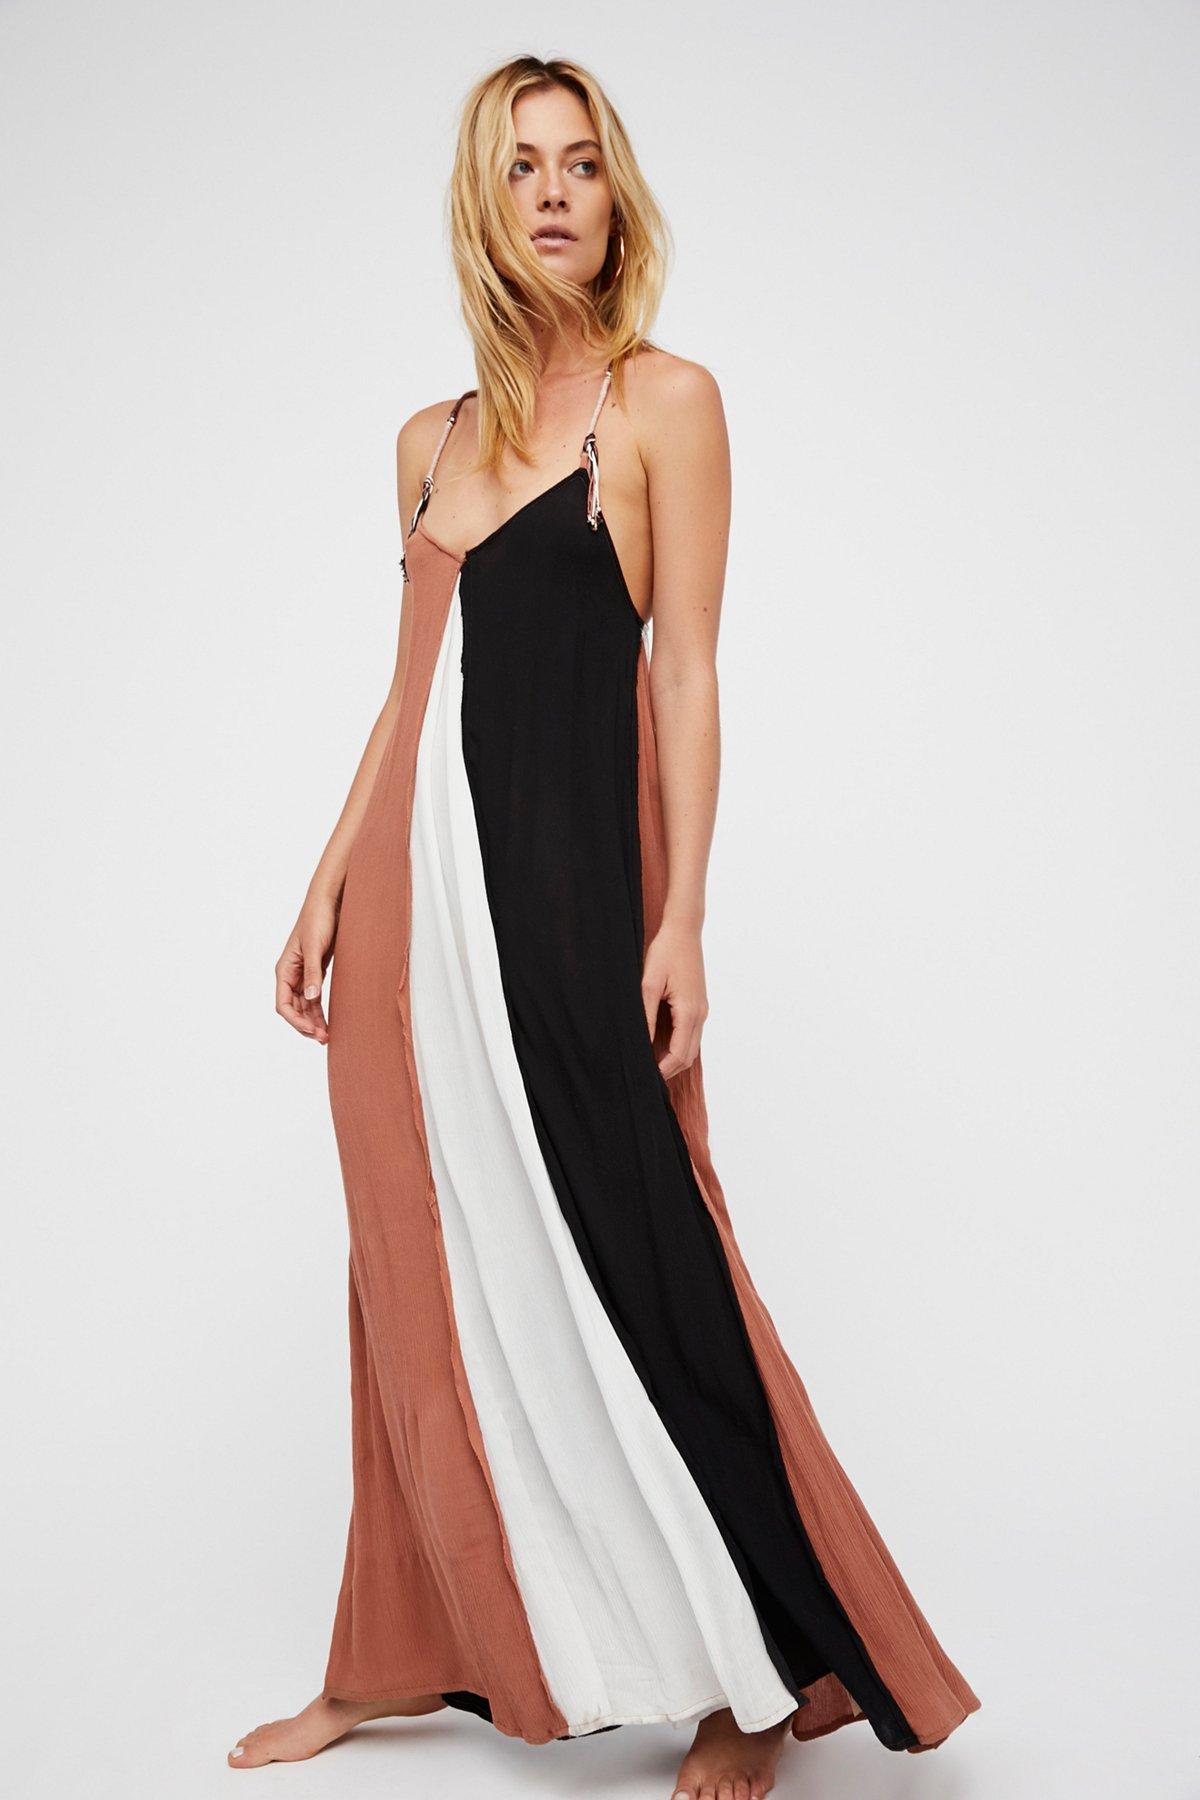 Mixin' It Up Maxi Dress